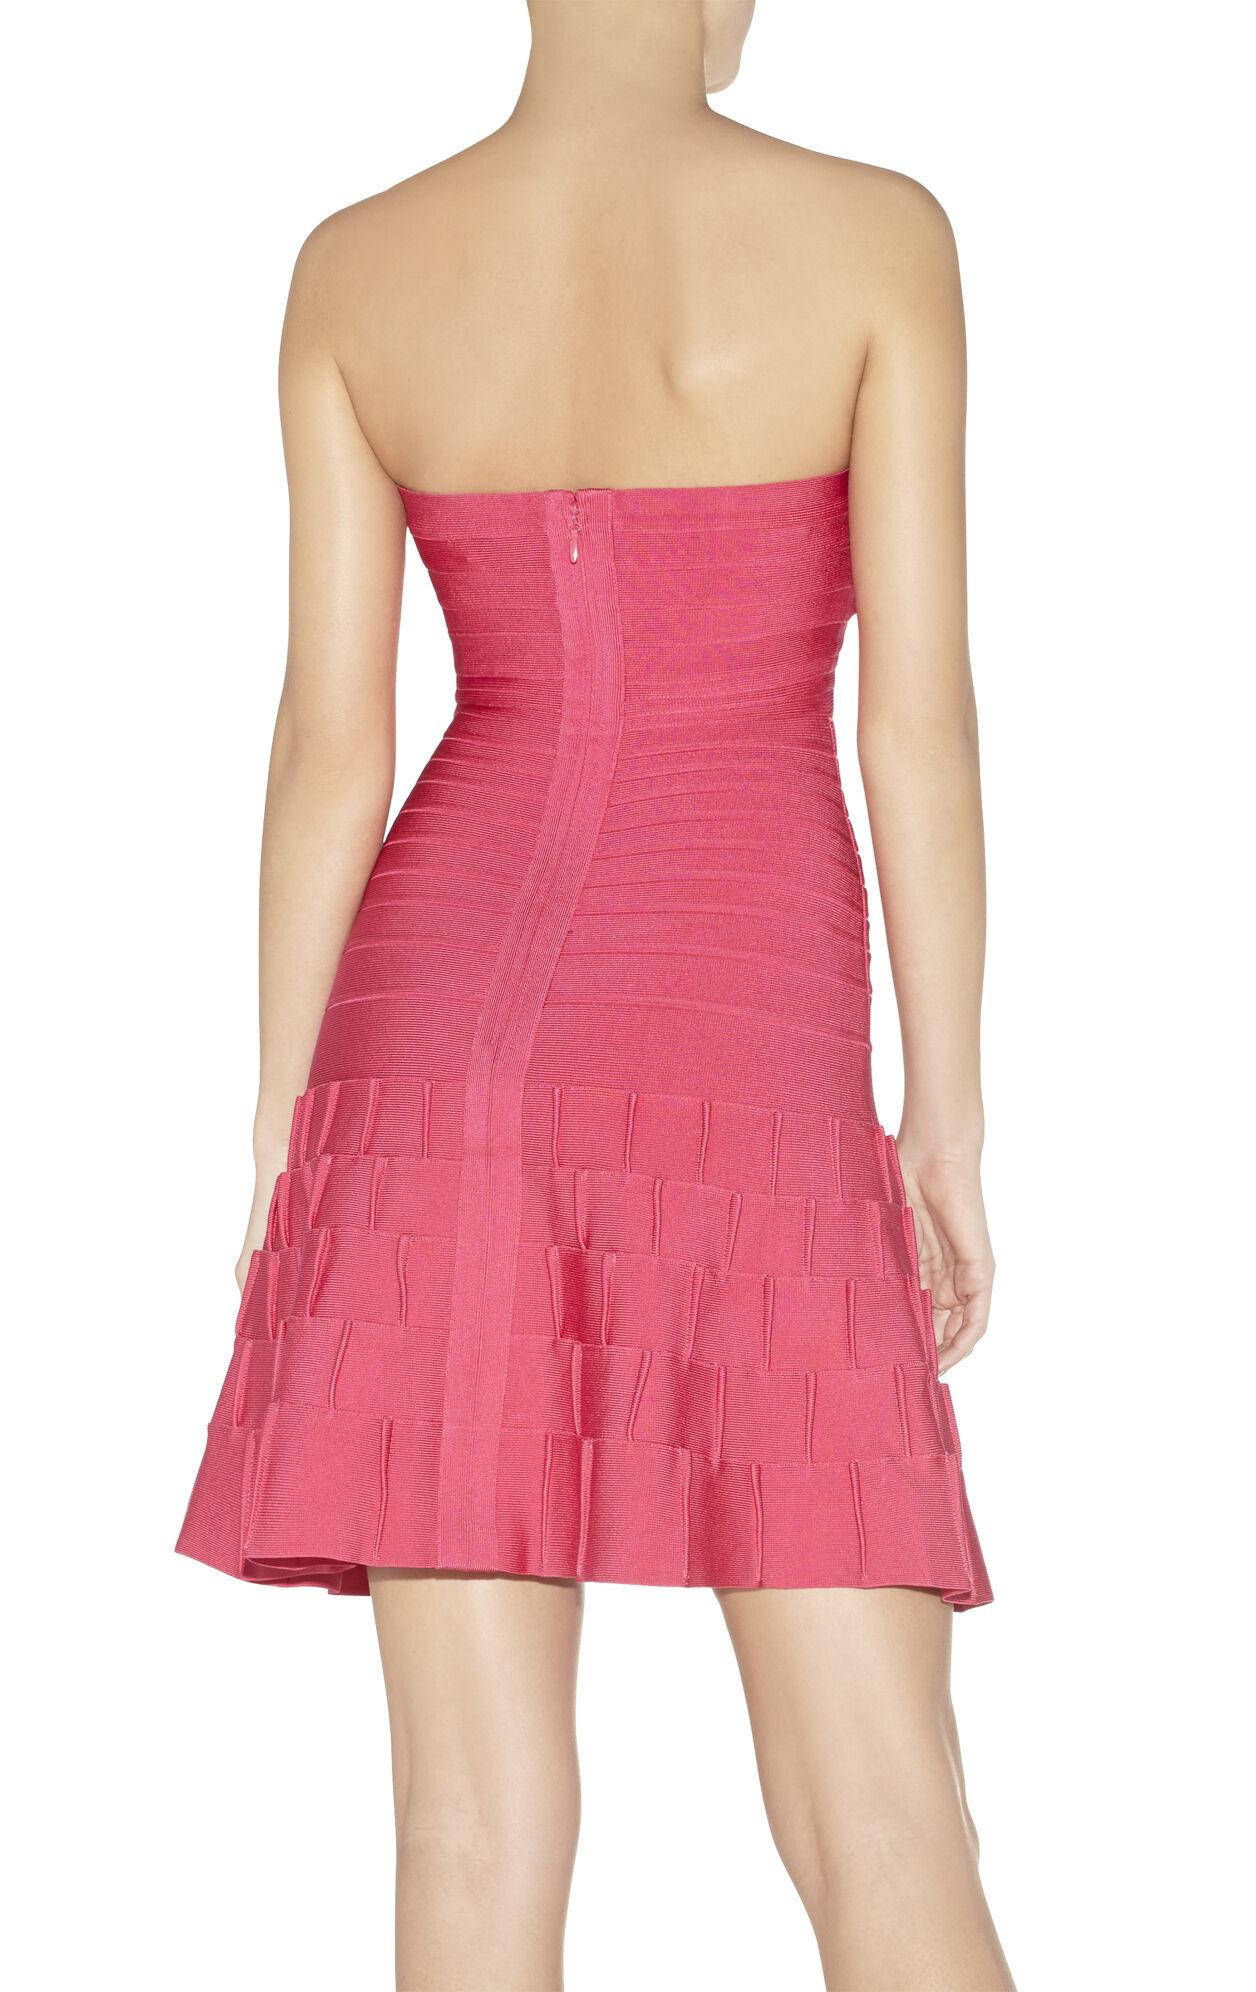 Arlene Novelty Essentials Dress